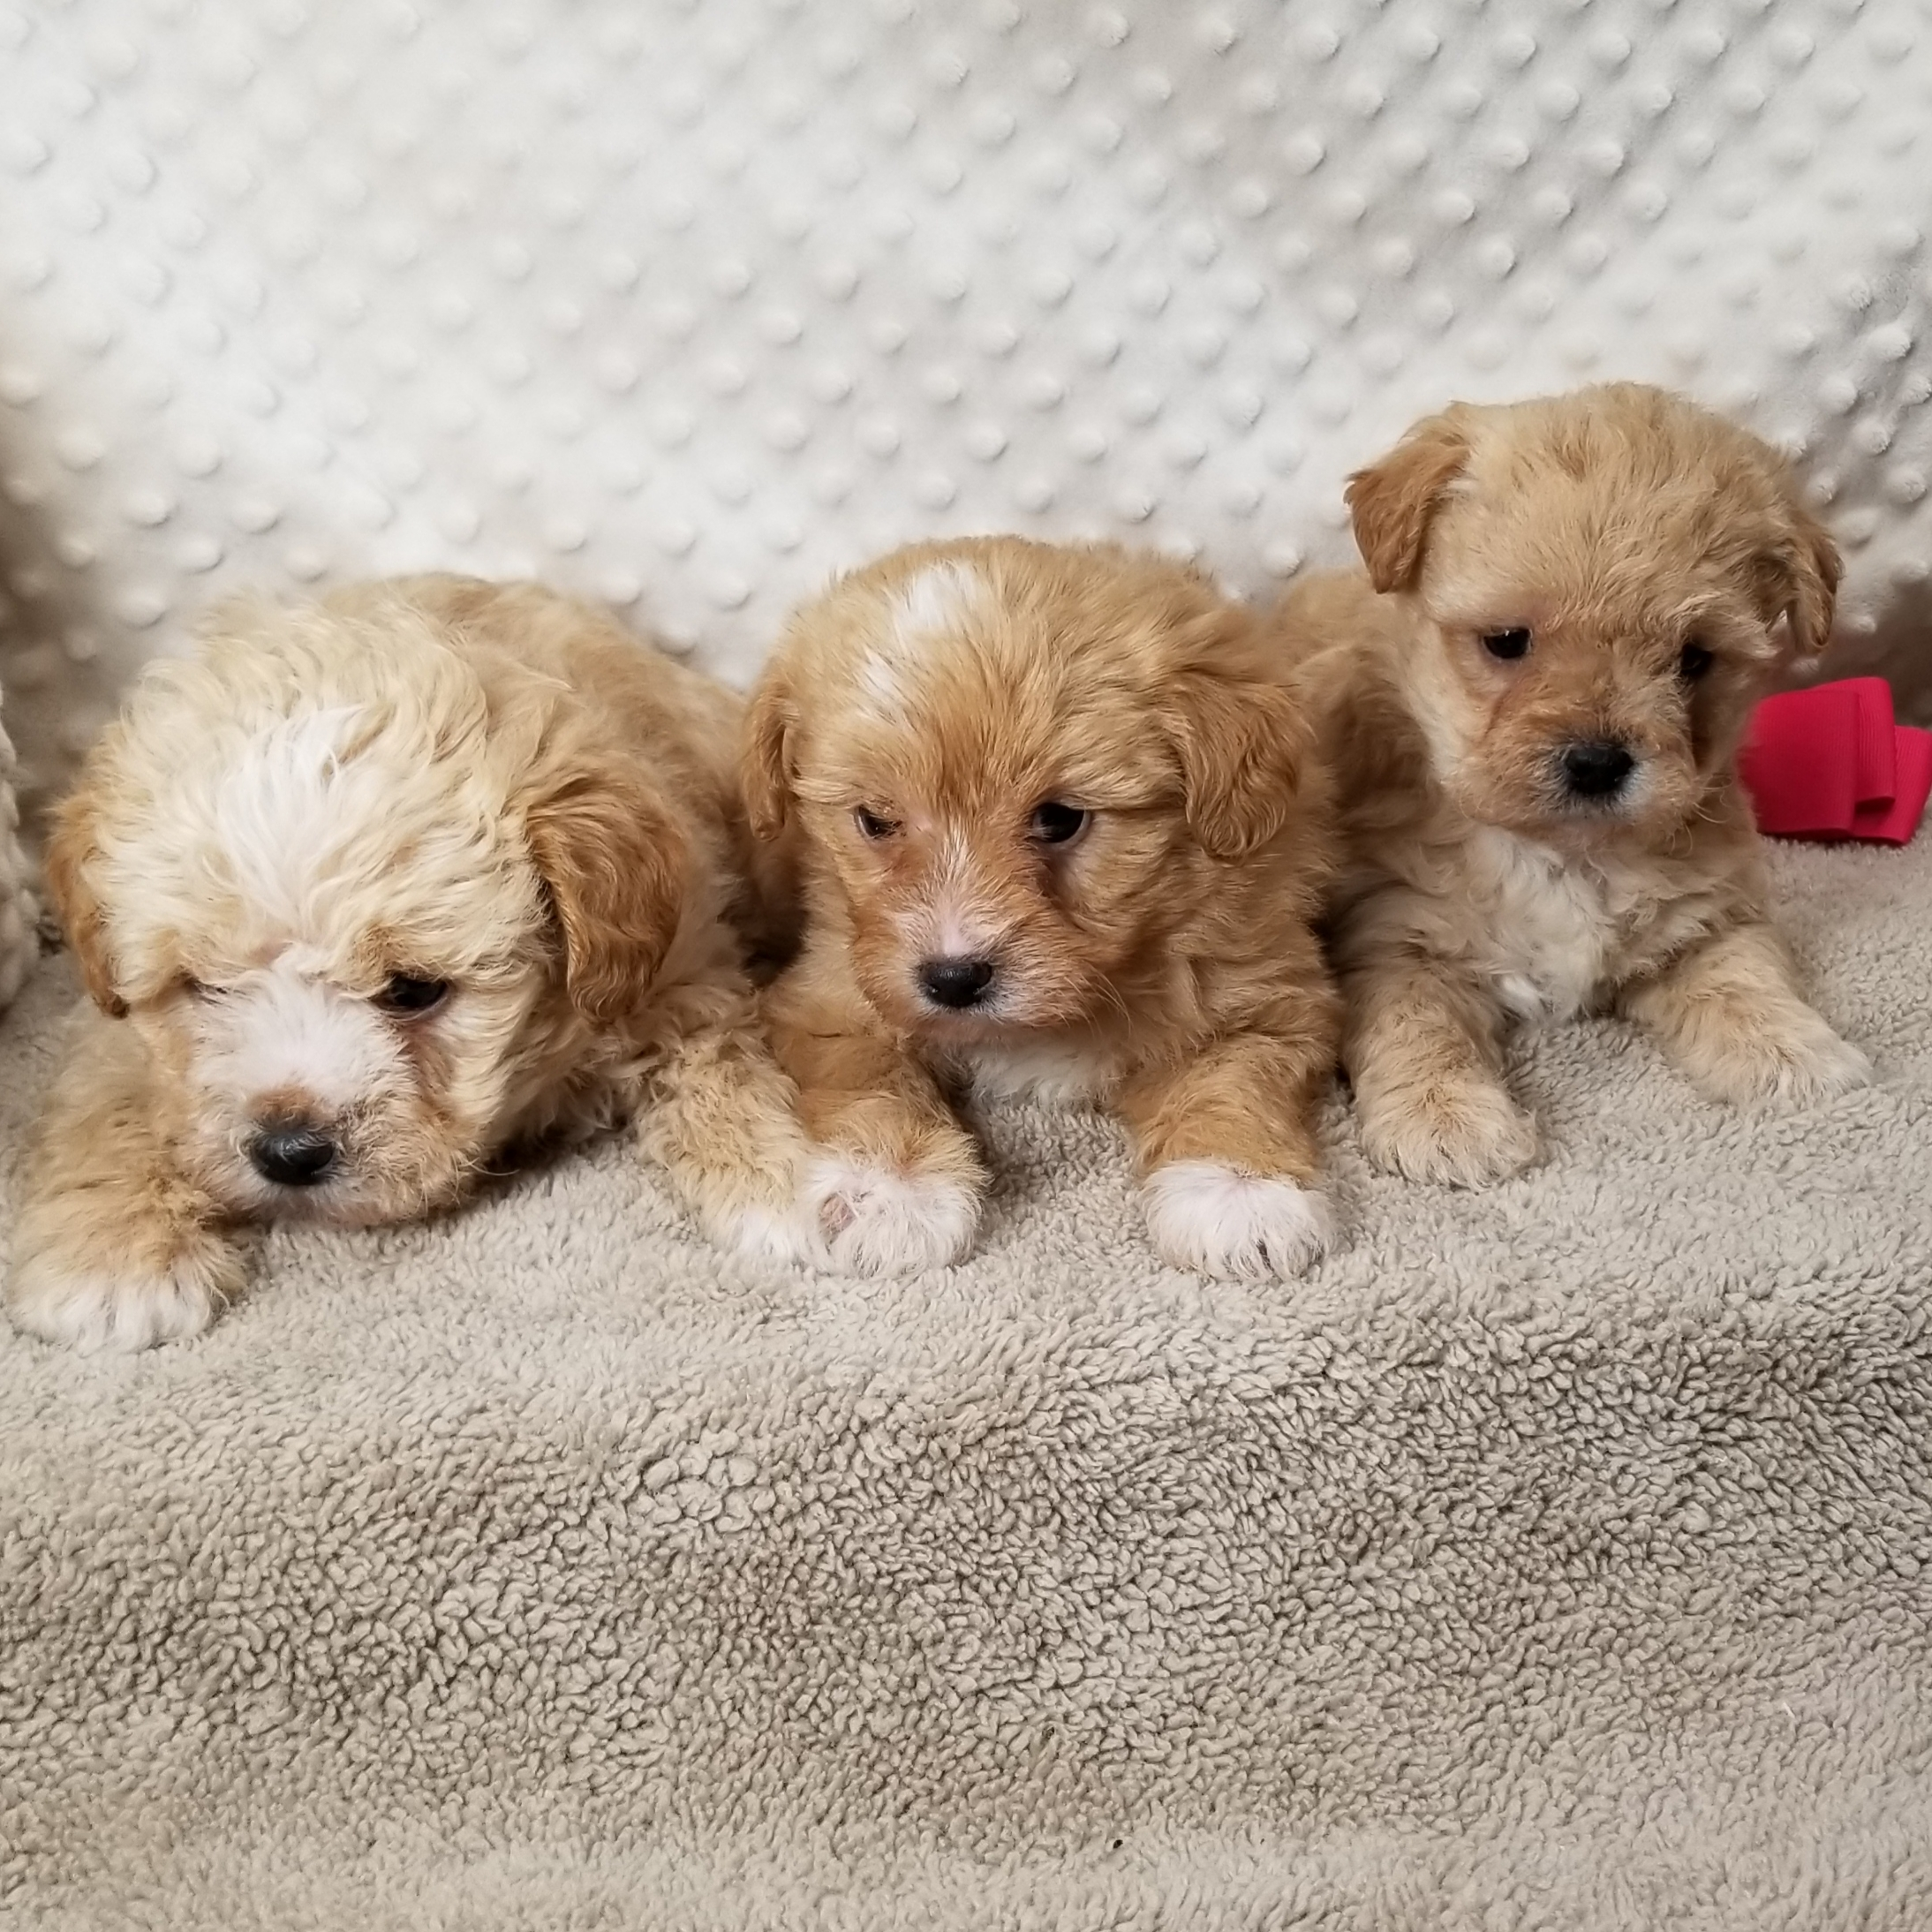 CKC ShorkiePoo Female Puppies born on 12/14,2020 Saturday $900/$950 each